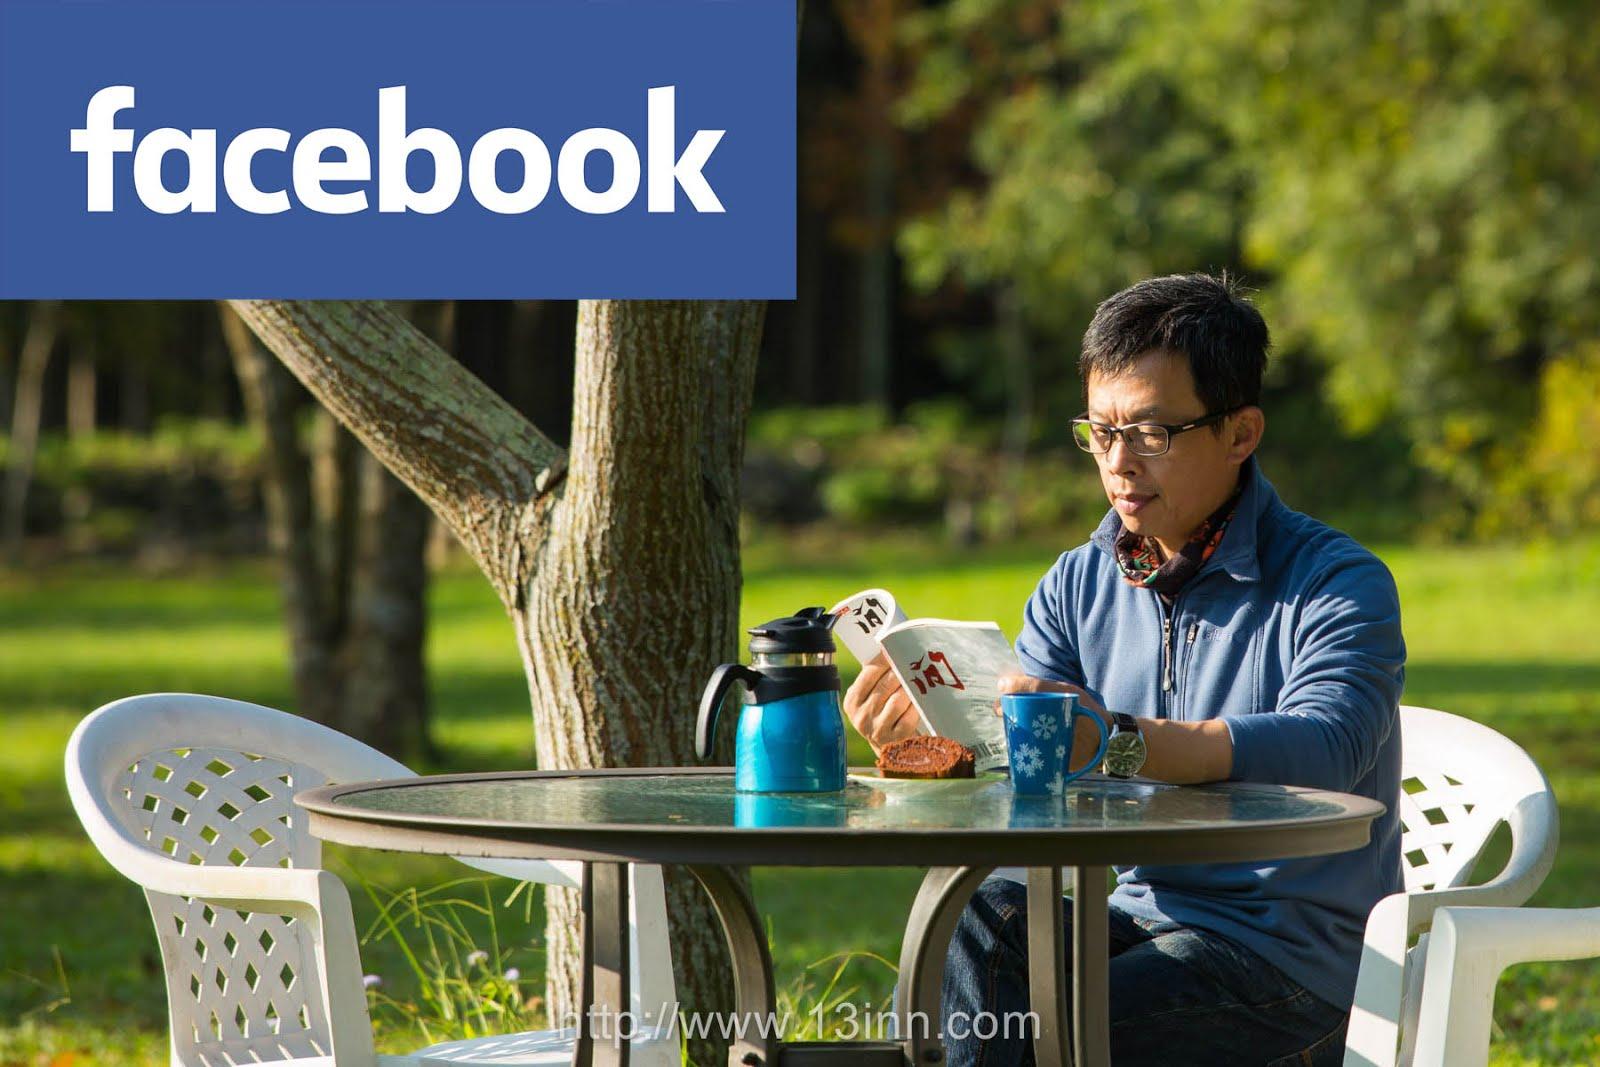 James Facebook